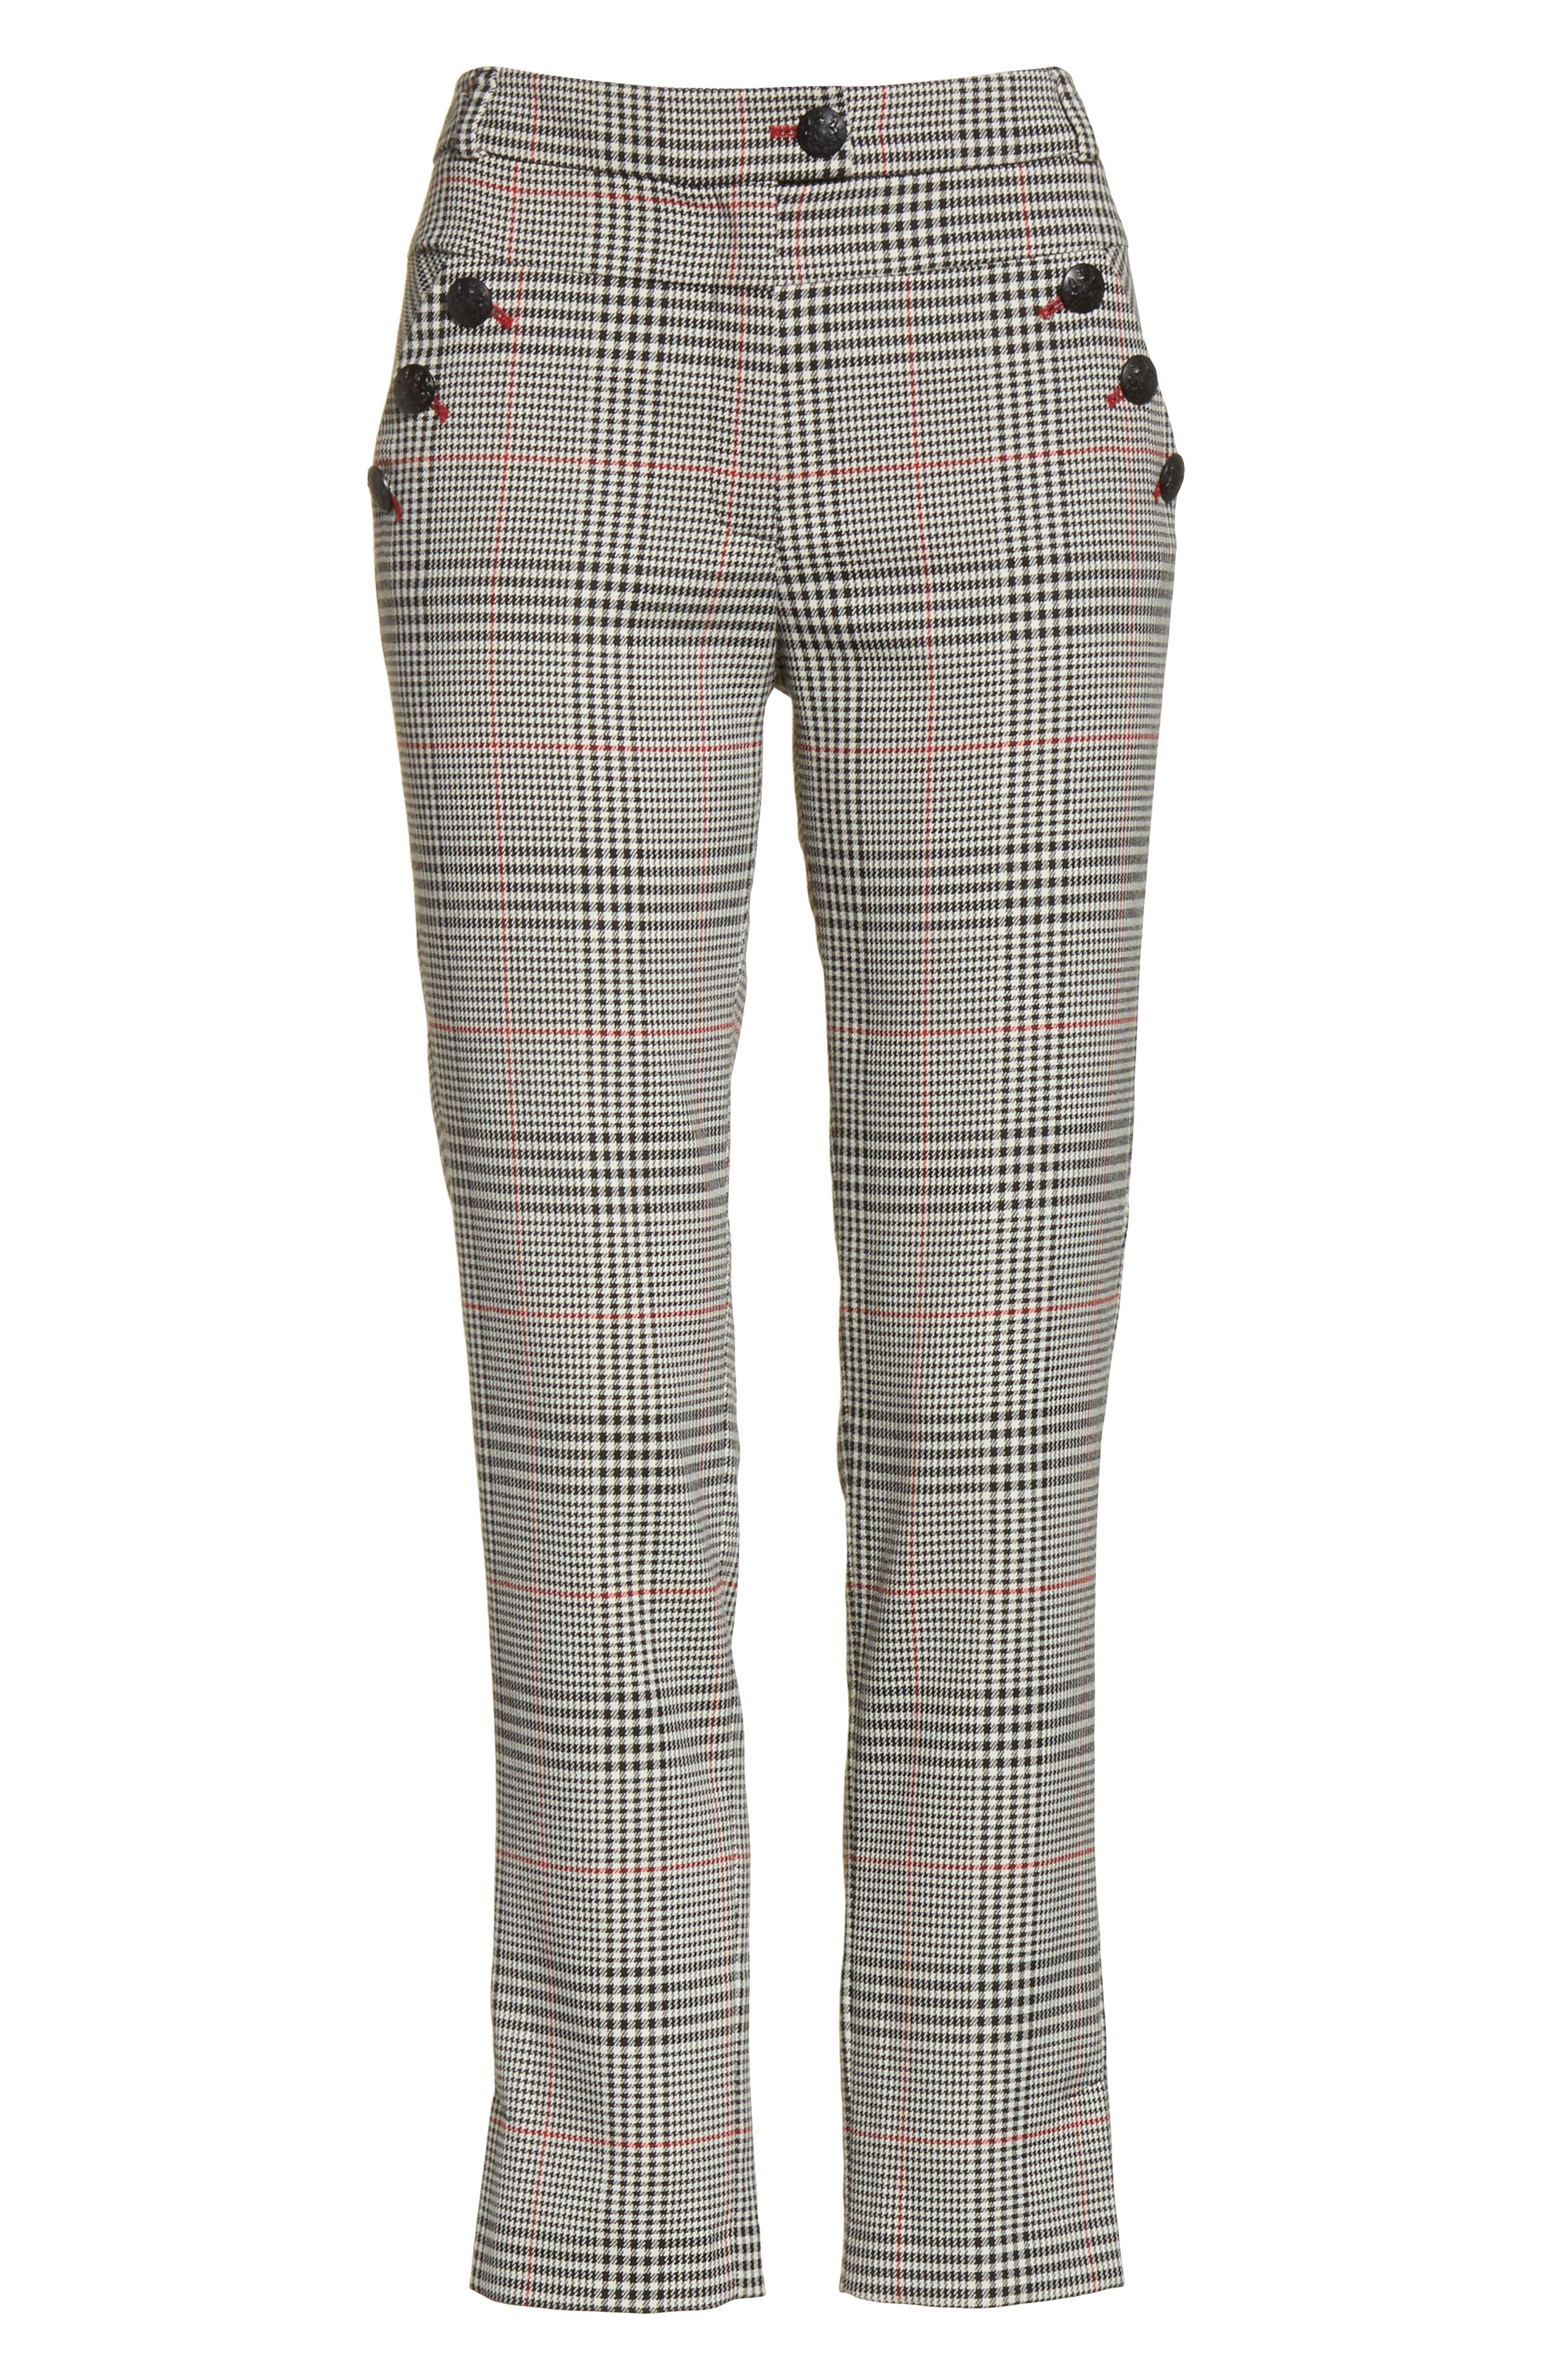 Farrow Pants,                             Alternate thumbnail 6, color,                             White/ Black/ Red